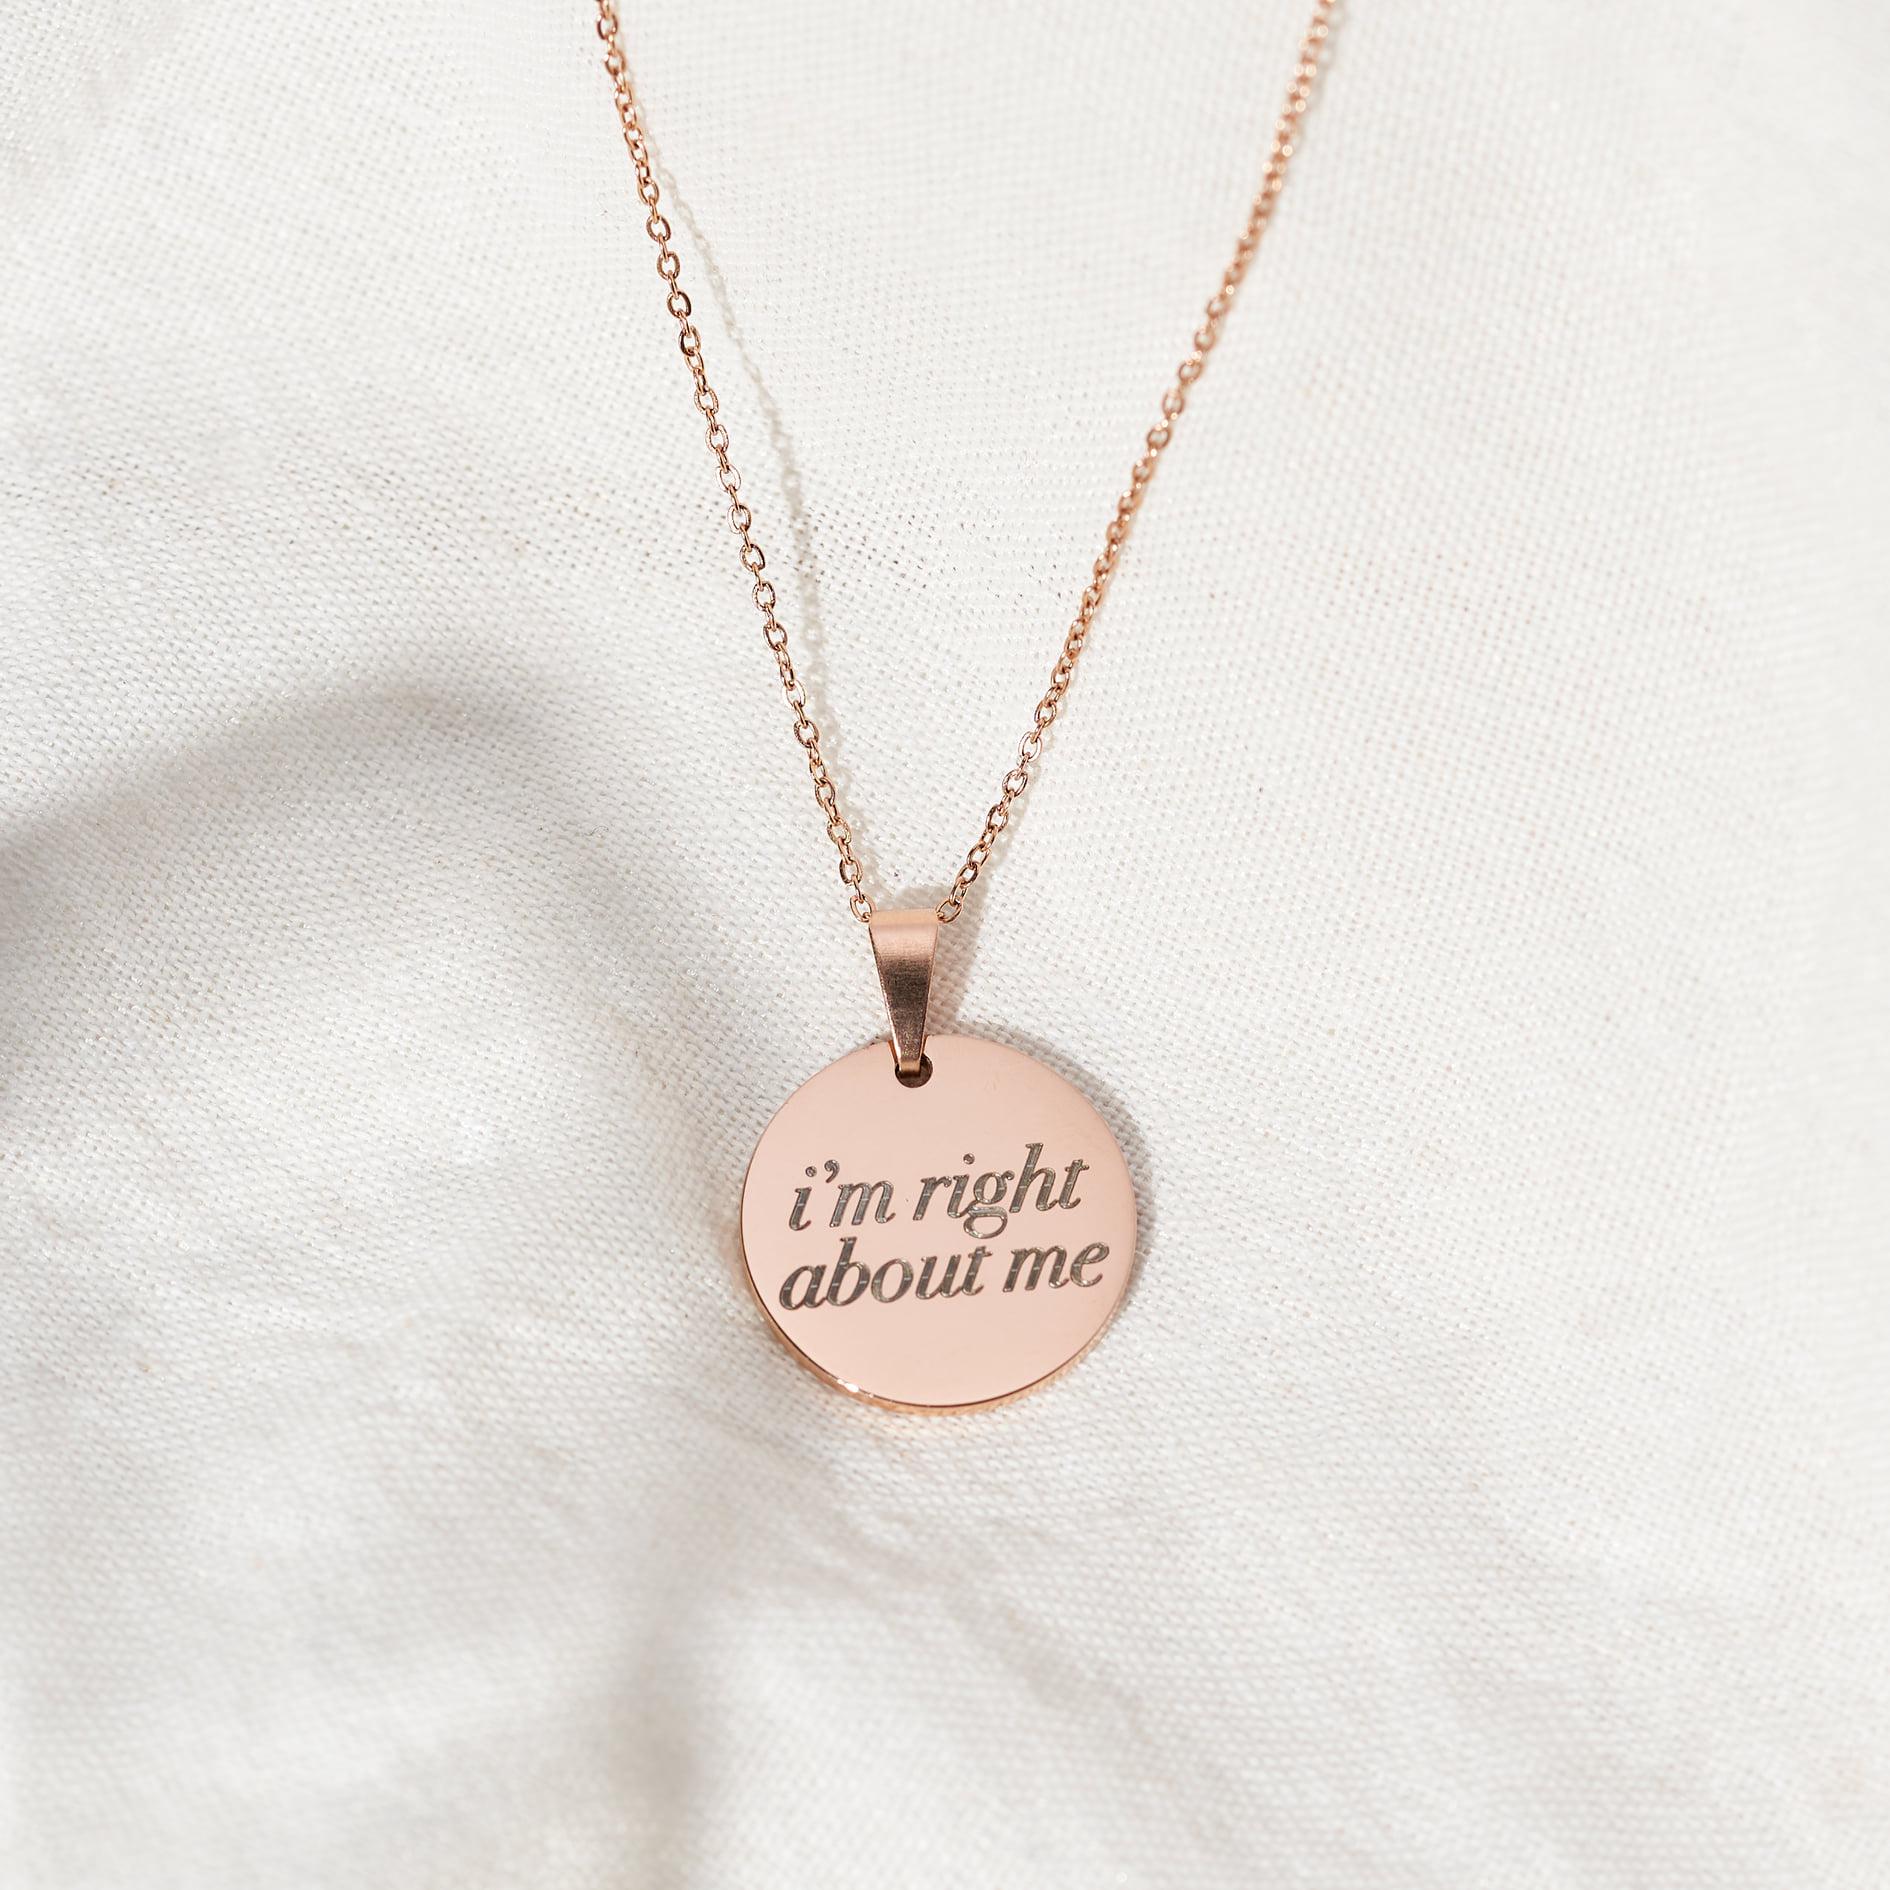 Ayn Bernos x Talaala PH jewelry collection: necklace